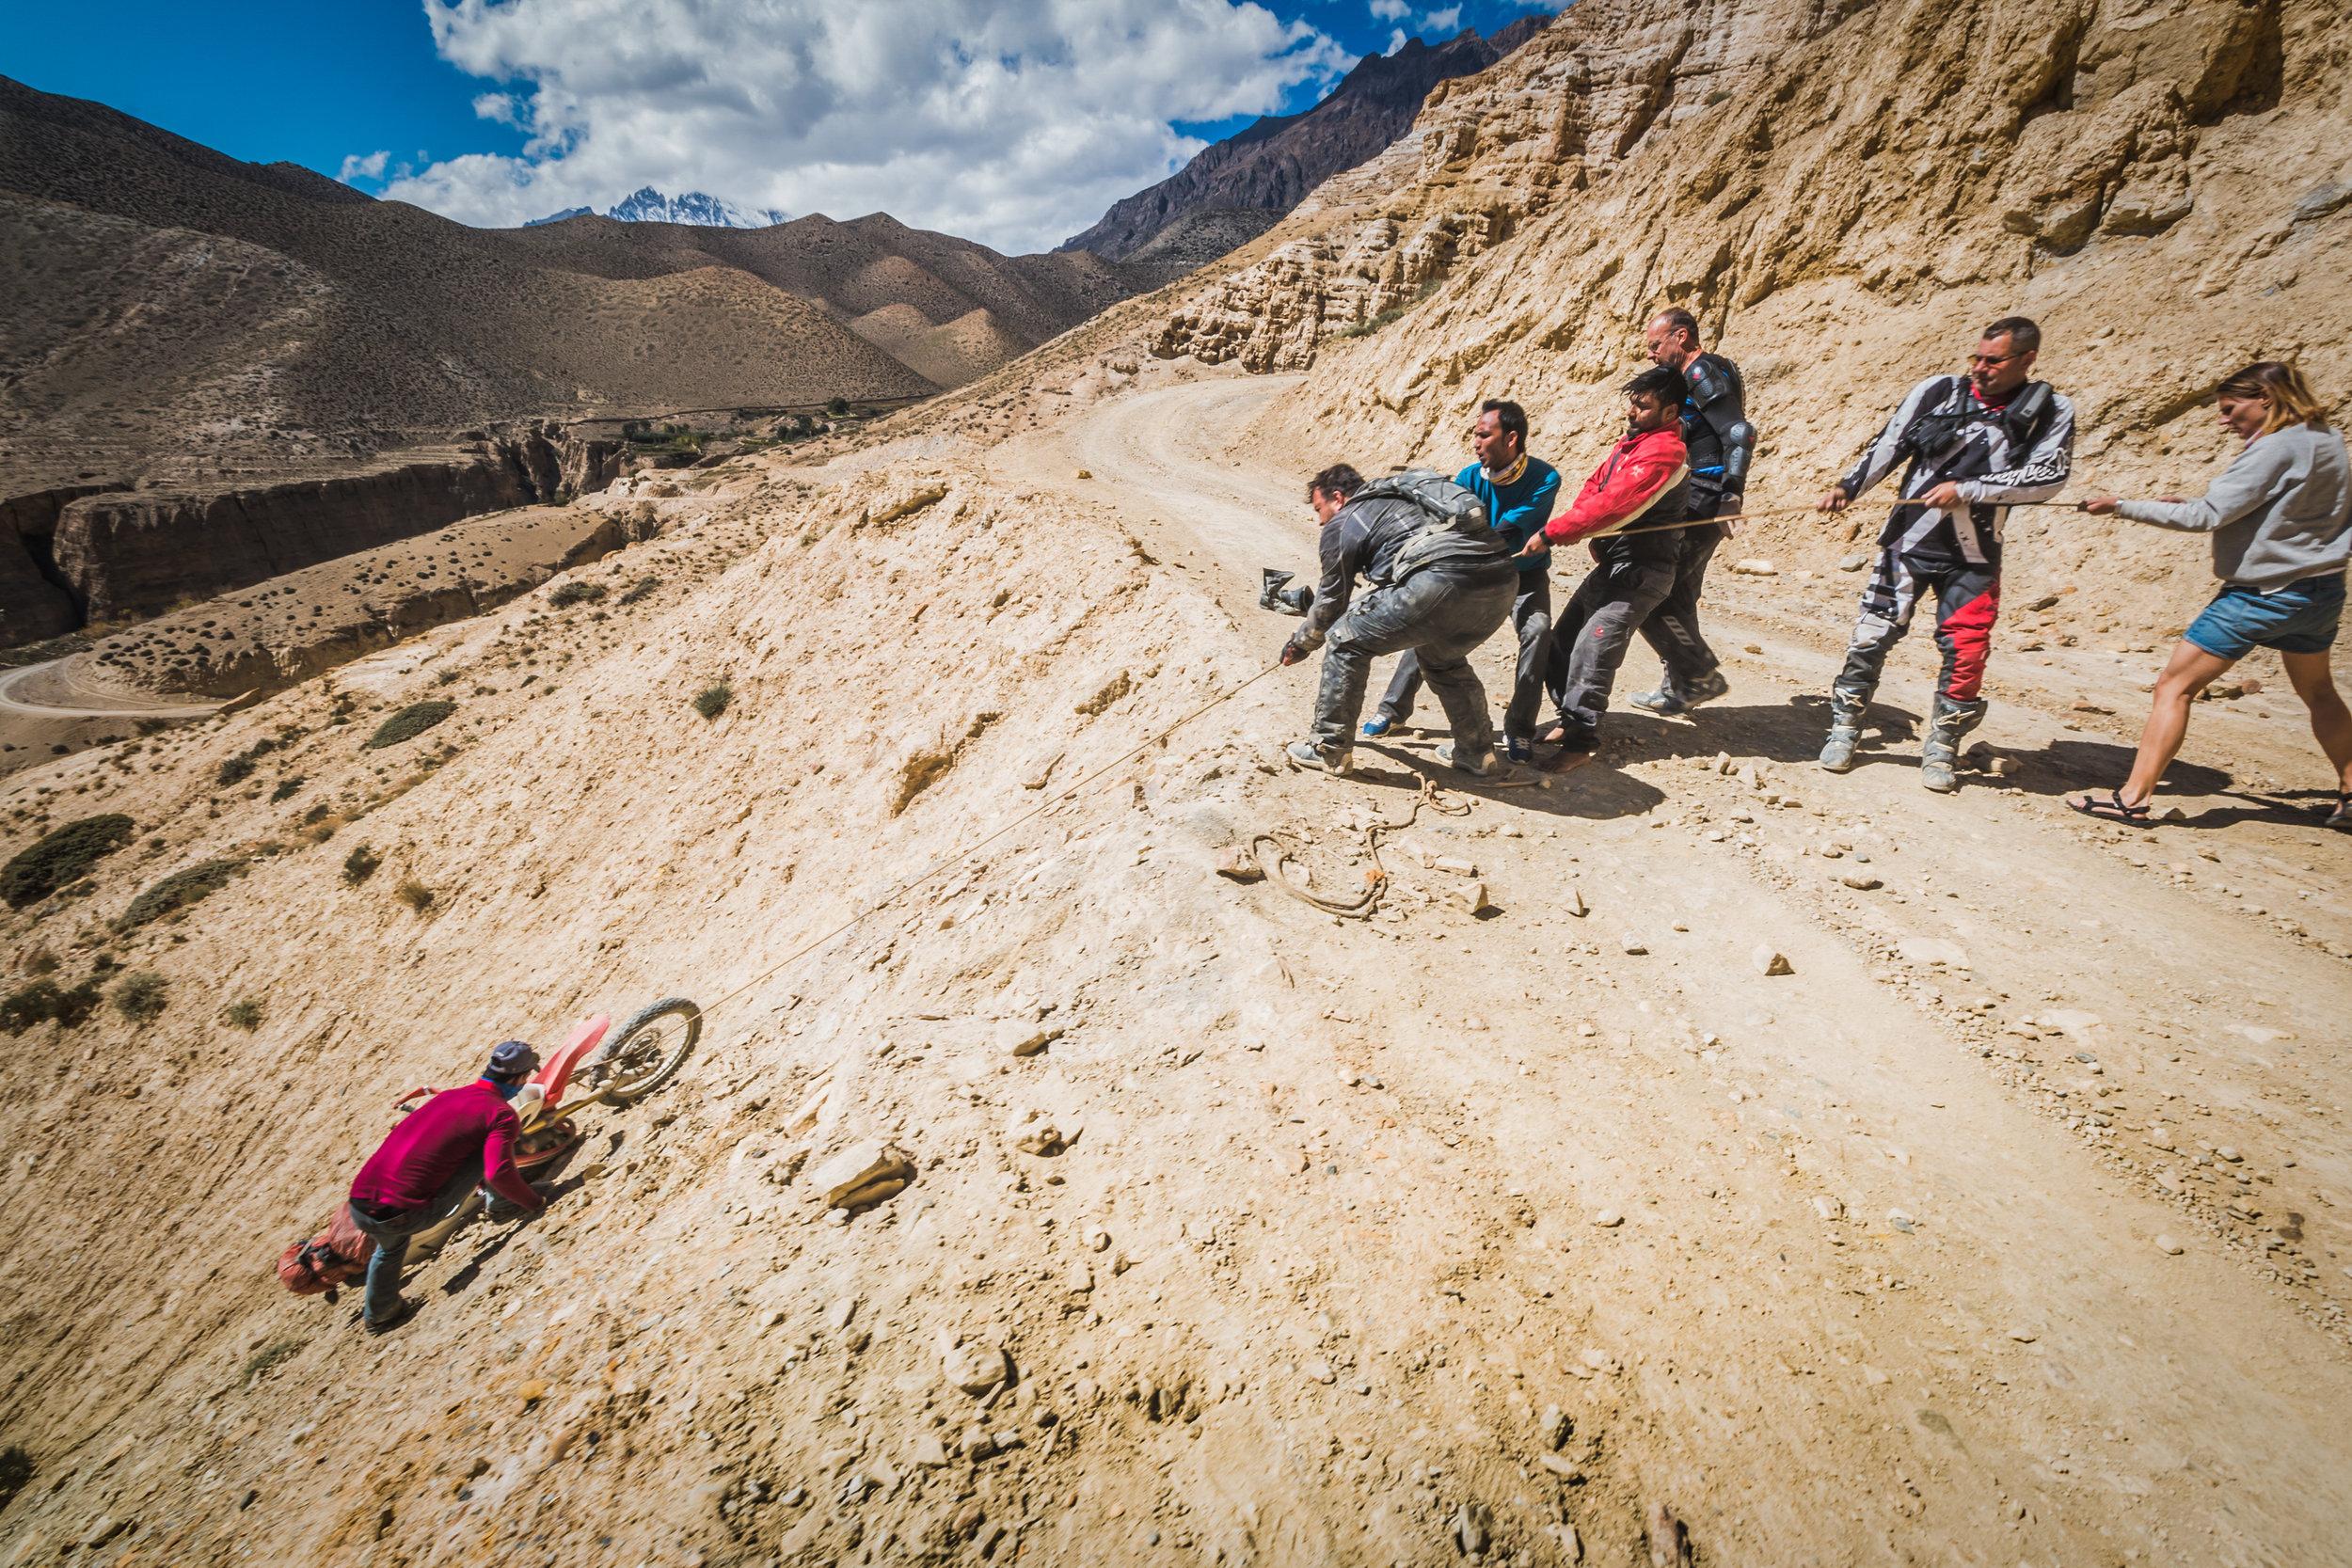 TWHMC-nepal-motorcycle-adventure-2016-0591-2-2.jpg